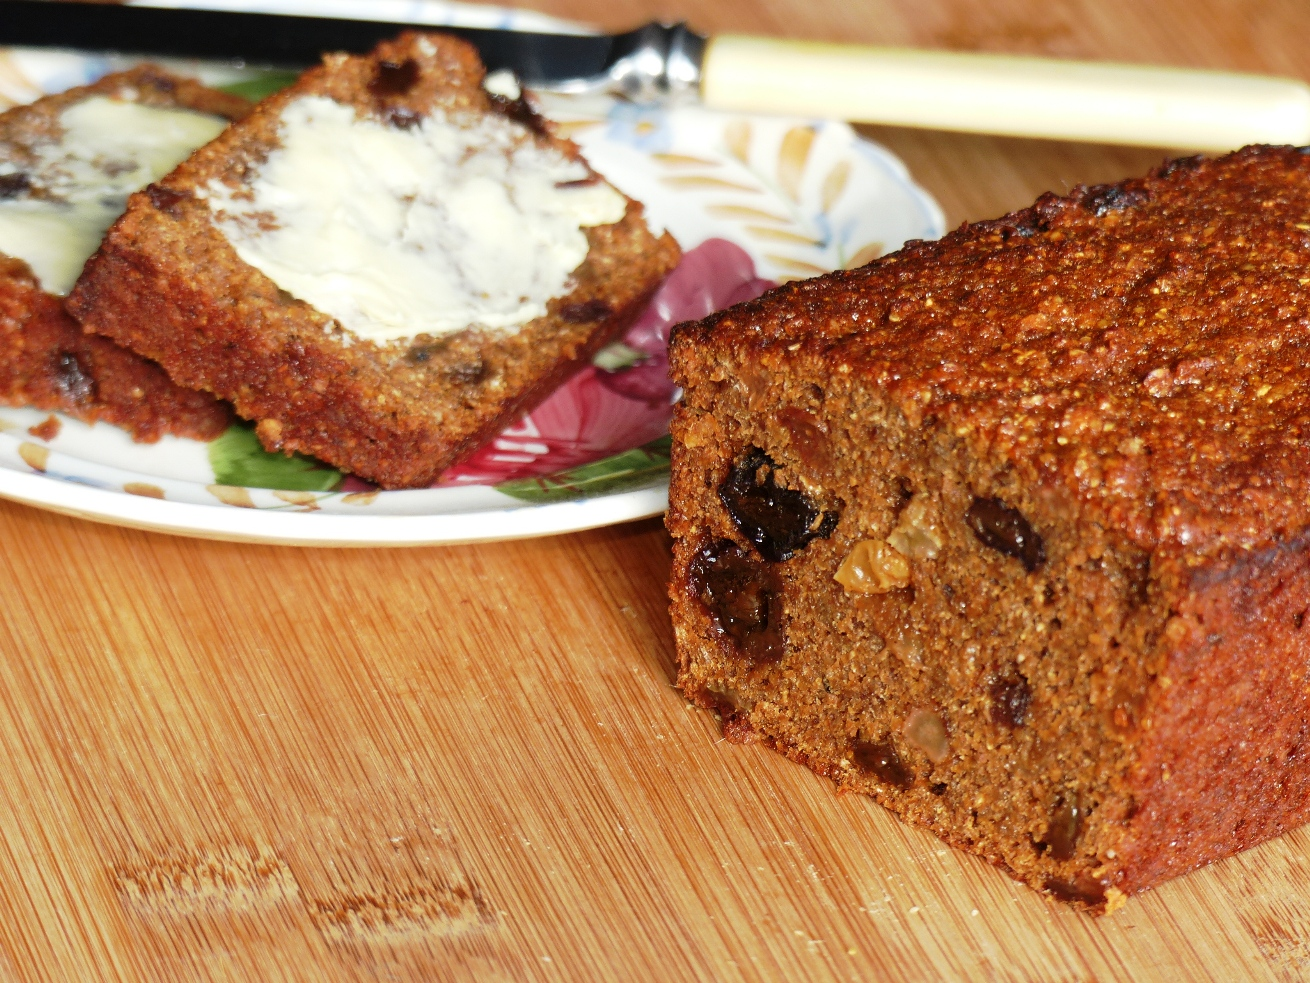 Gluten-free flax and buckwheat maltloaf